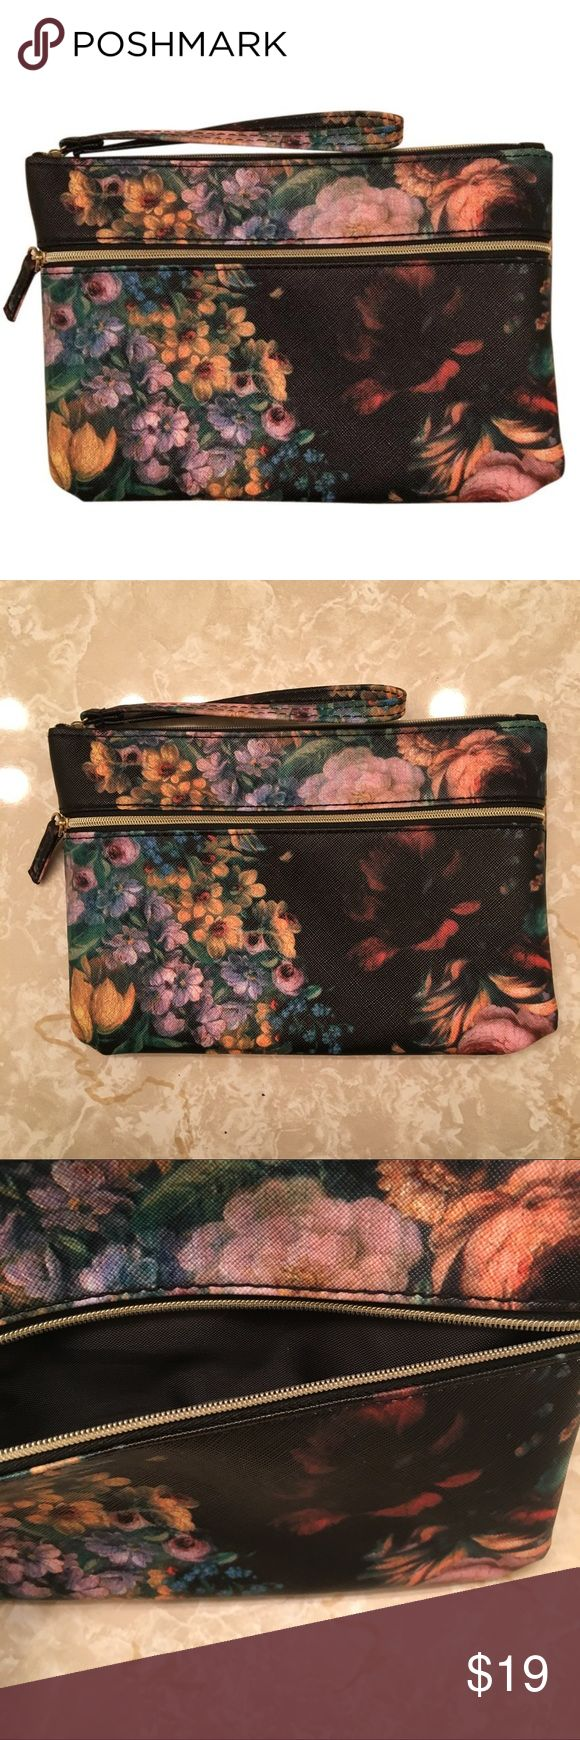 ✨ Floral Clutch Bag Floral Clutch Bag ShopChloeJean.com Bags Clutches & Wristlets